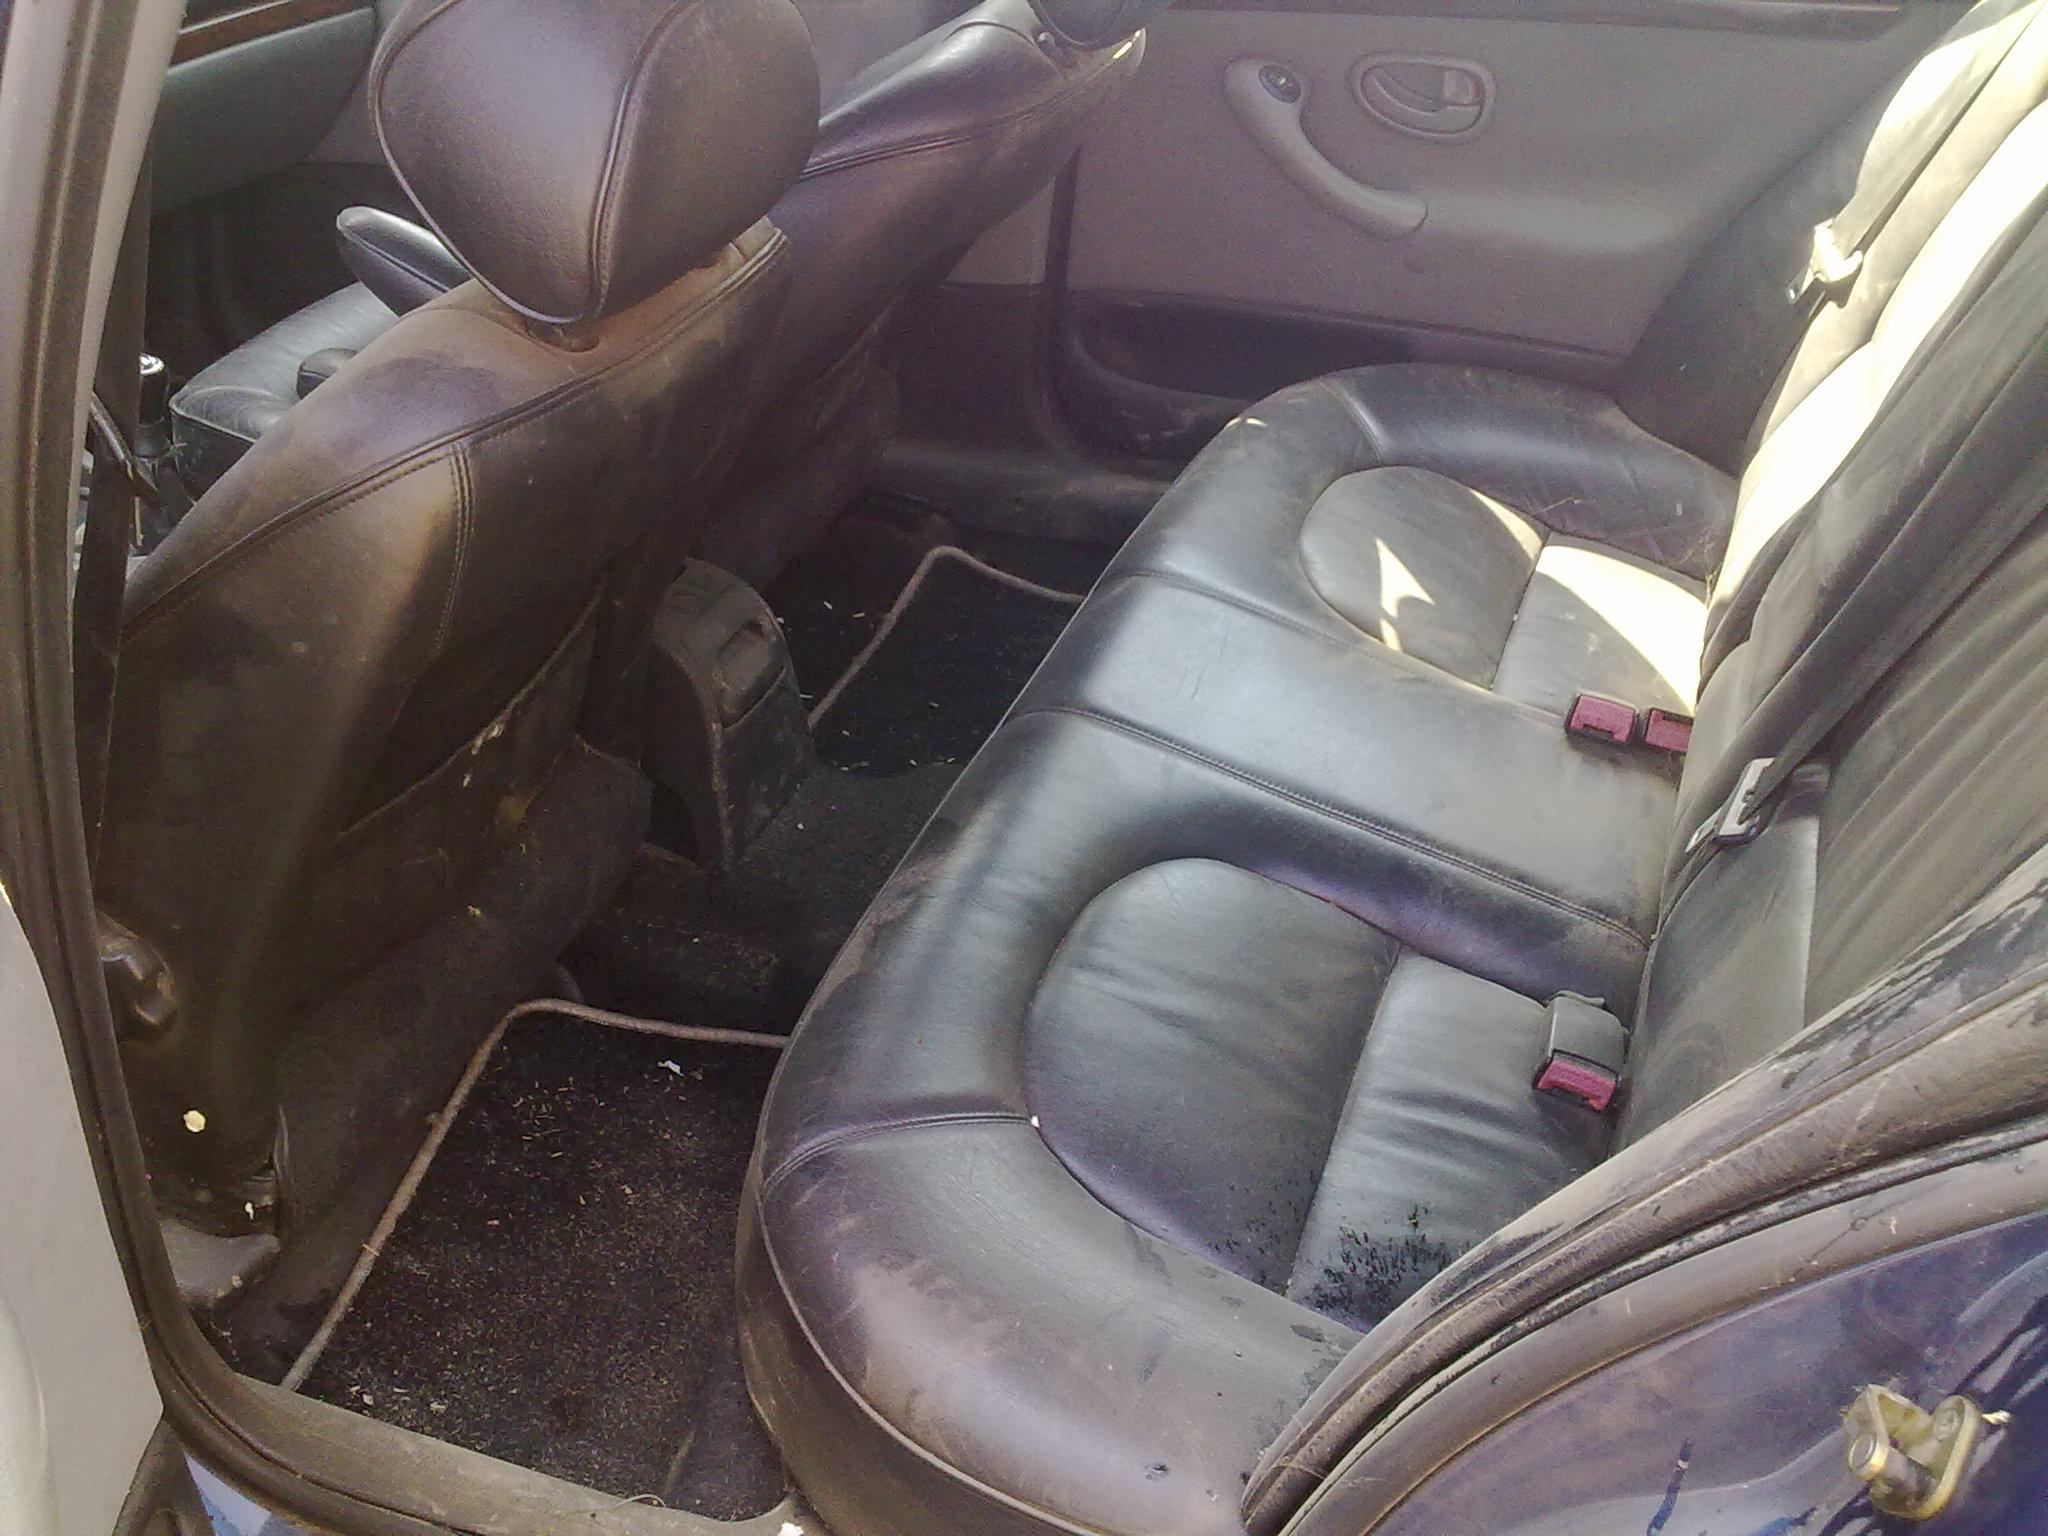 Peugeot 406 avariat 1997 Benzina Berlina - 04 Iunie 2011 - Poza 4